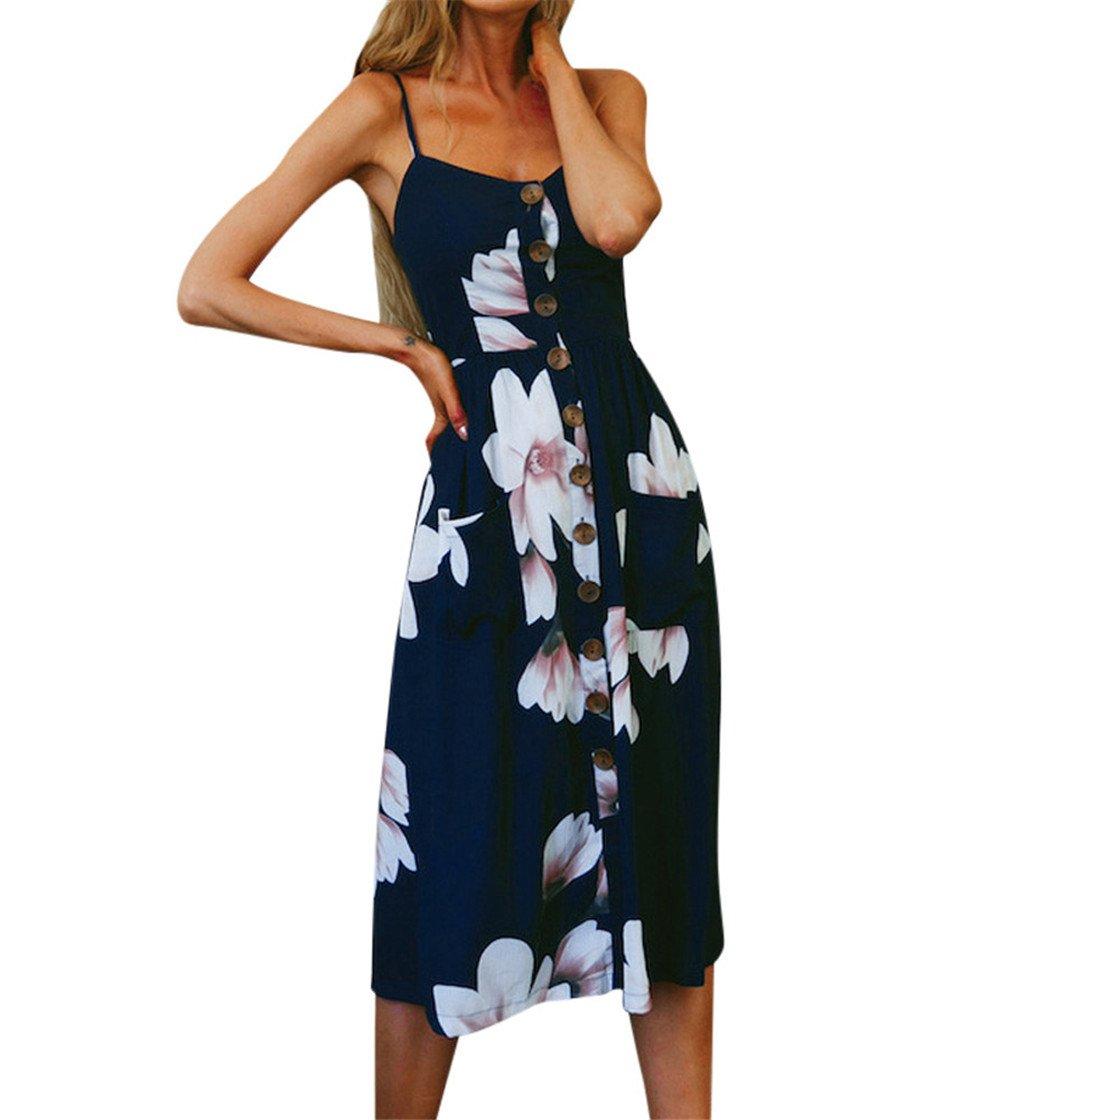 Mose Mini Dresses for Women, Women's Print Button Pocket Sling Elegant Tops Long Sleeve Floral Beach Party Fashion New Dresses (XL, Blue)